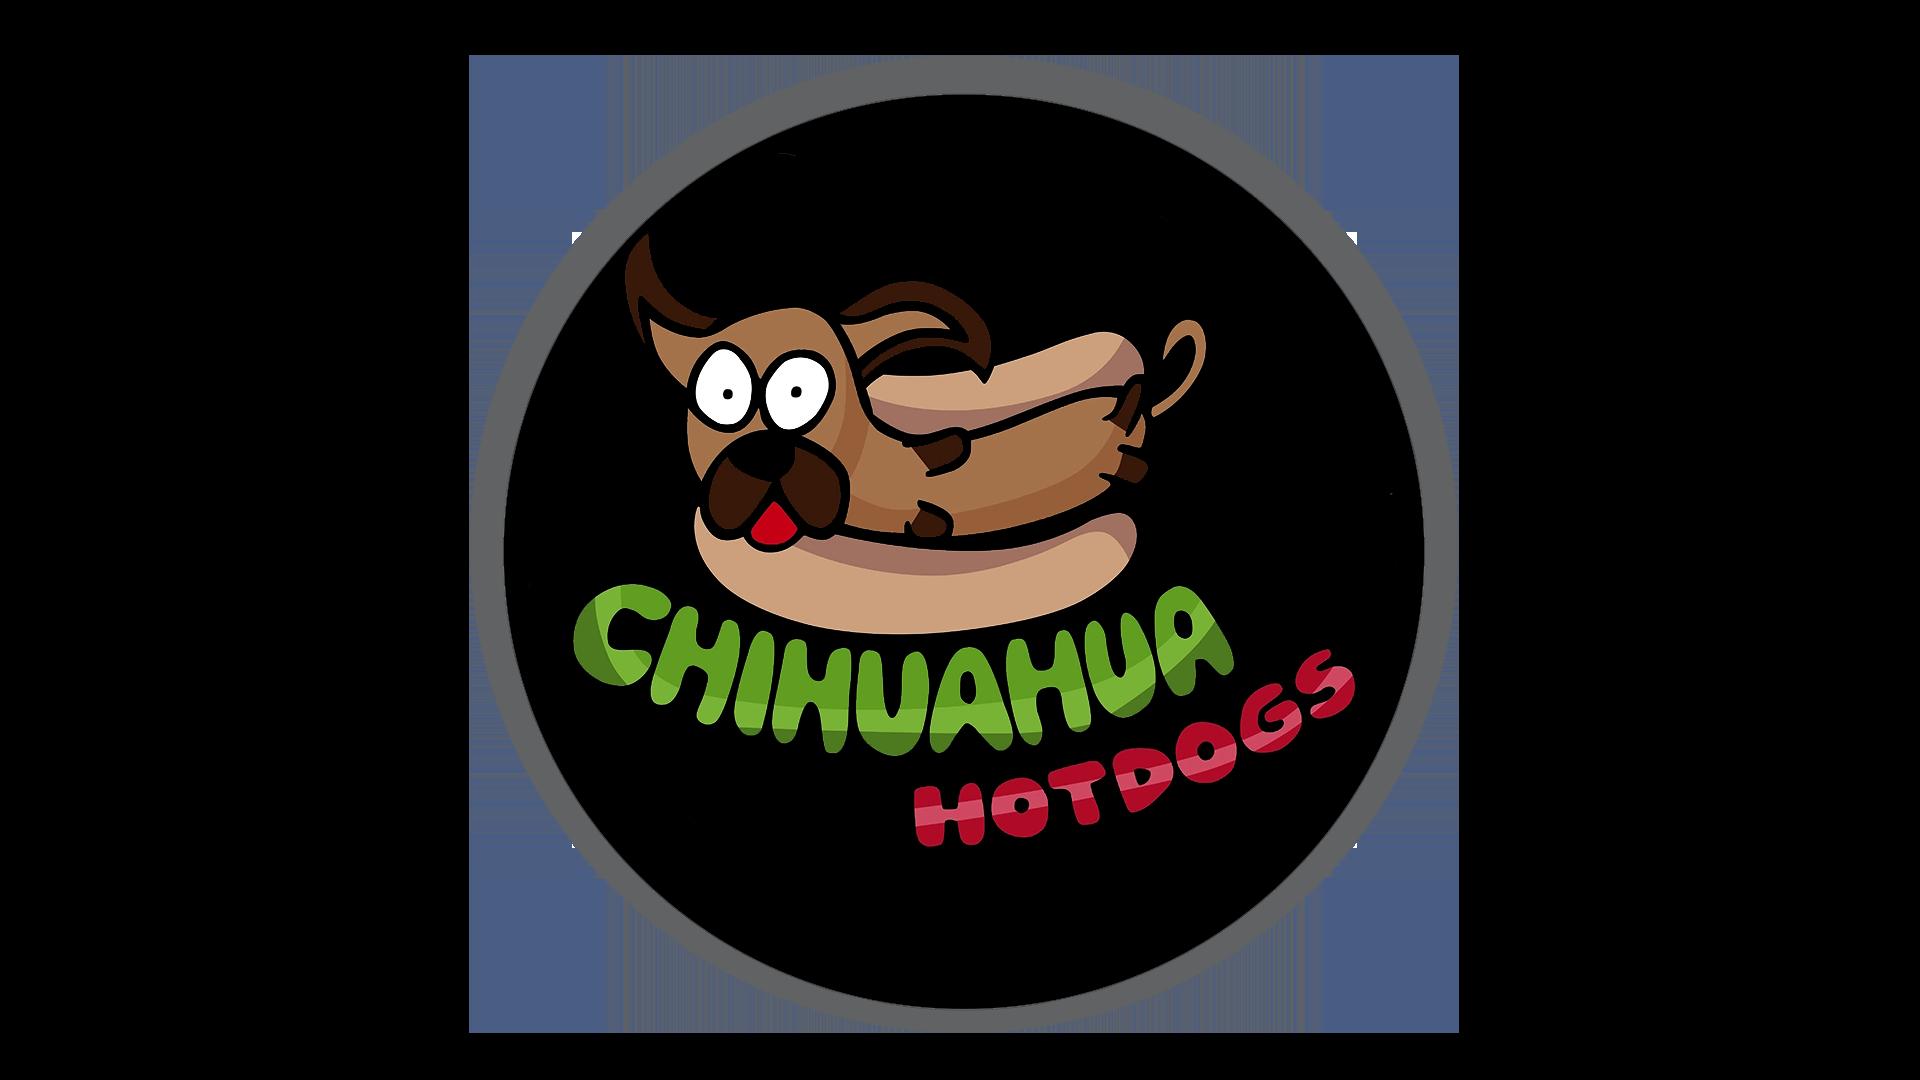 Chihuahua Hotdogs